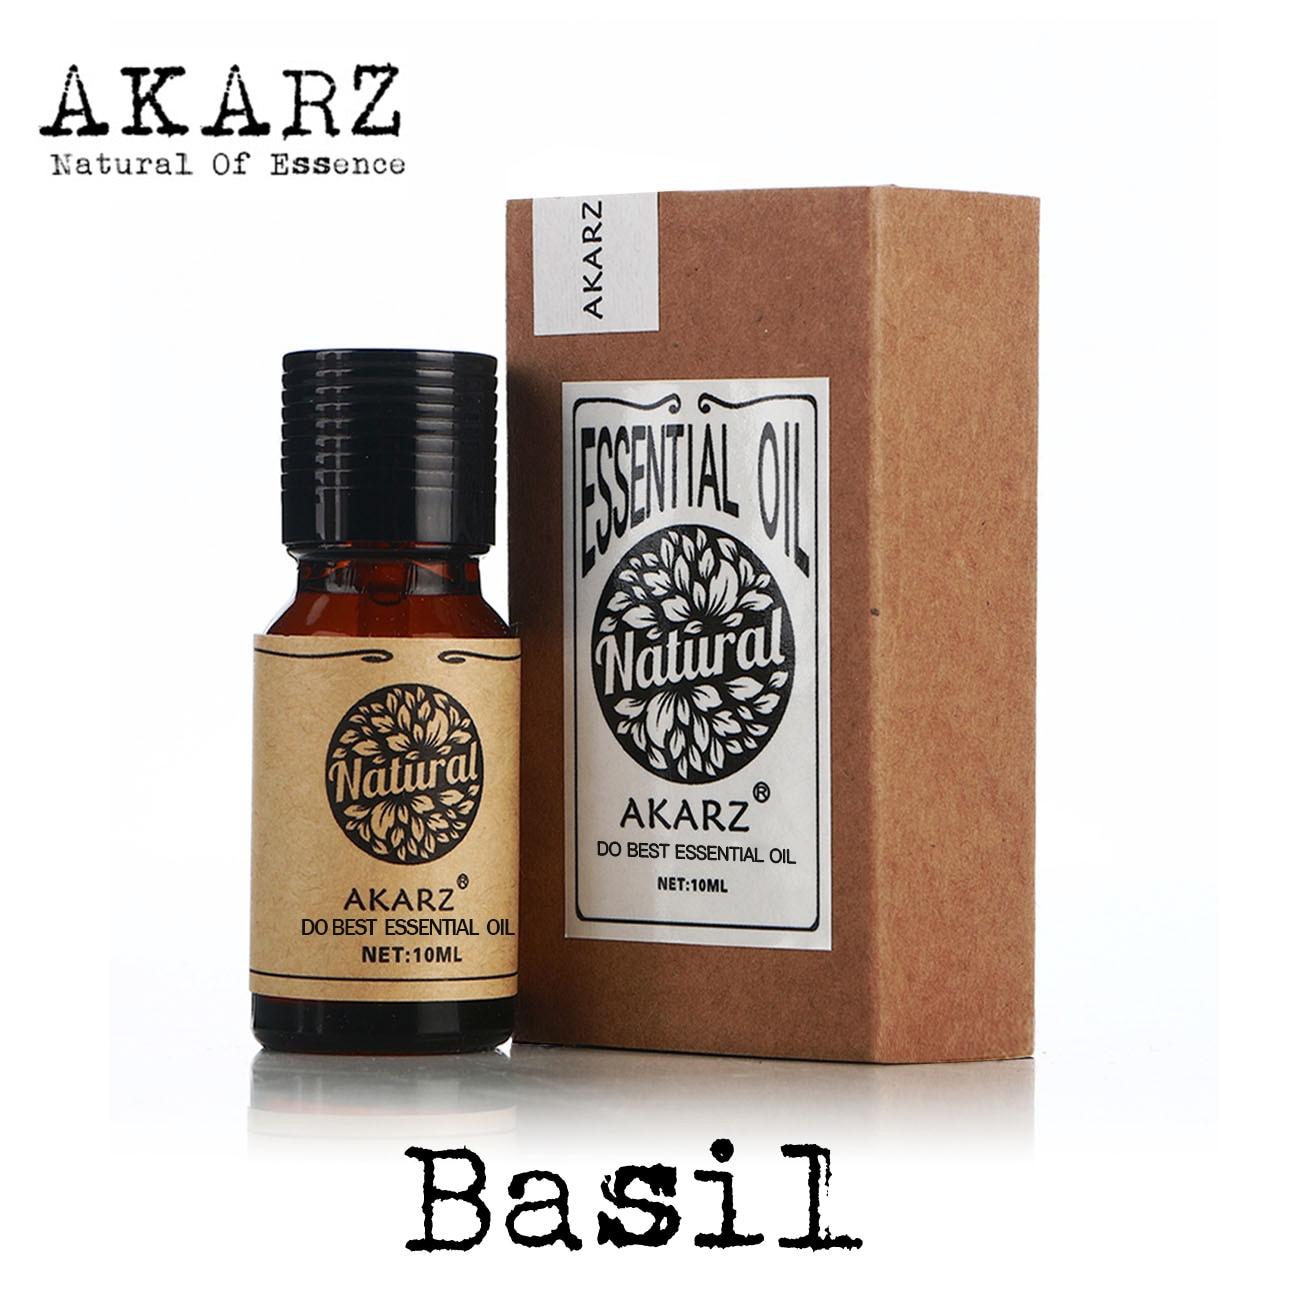 AKARZ Famous brand natural aromatherapy basil oil Improve spirit Stabilization effect Firming Oil balance basil essential oil basil